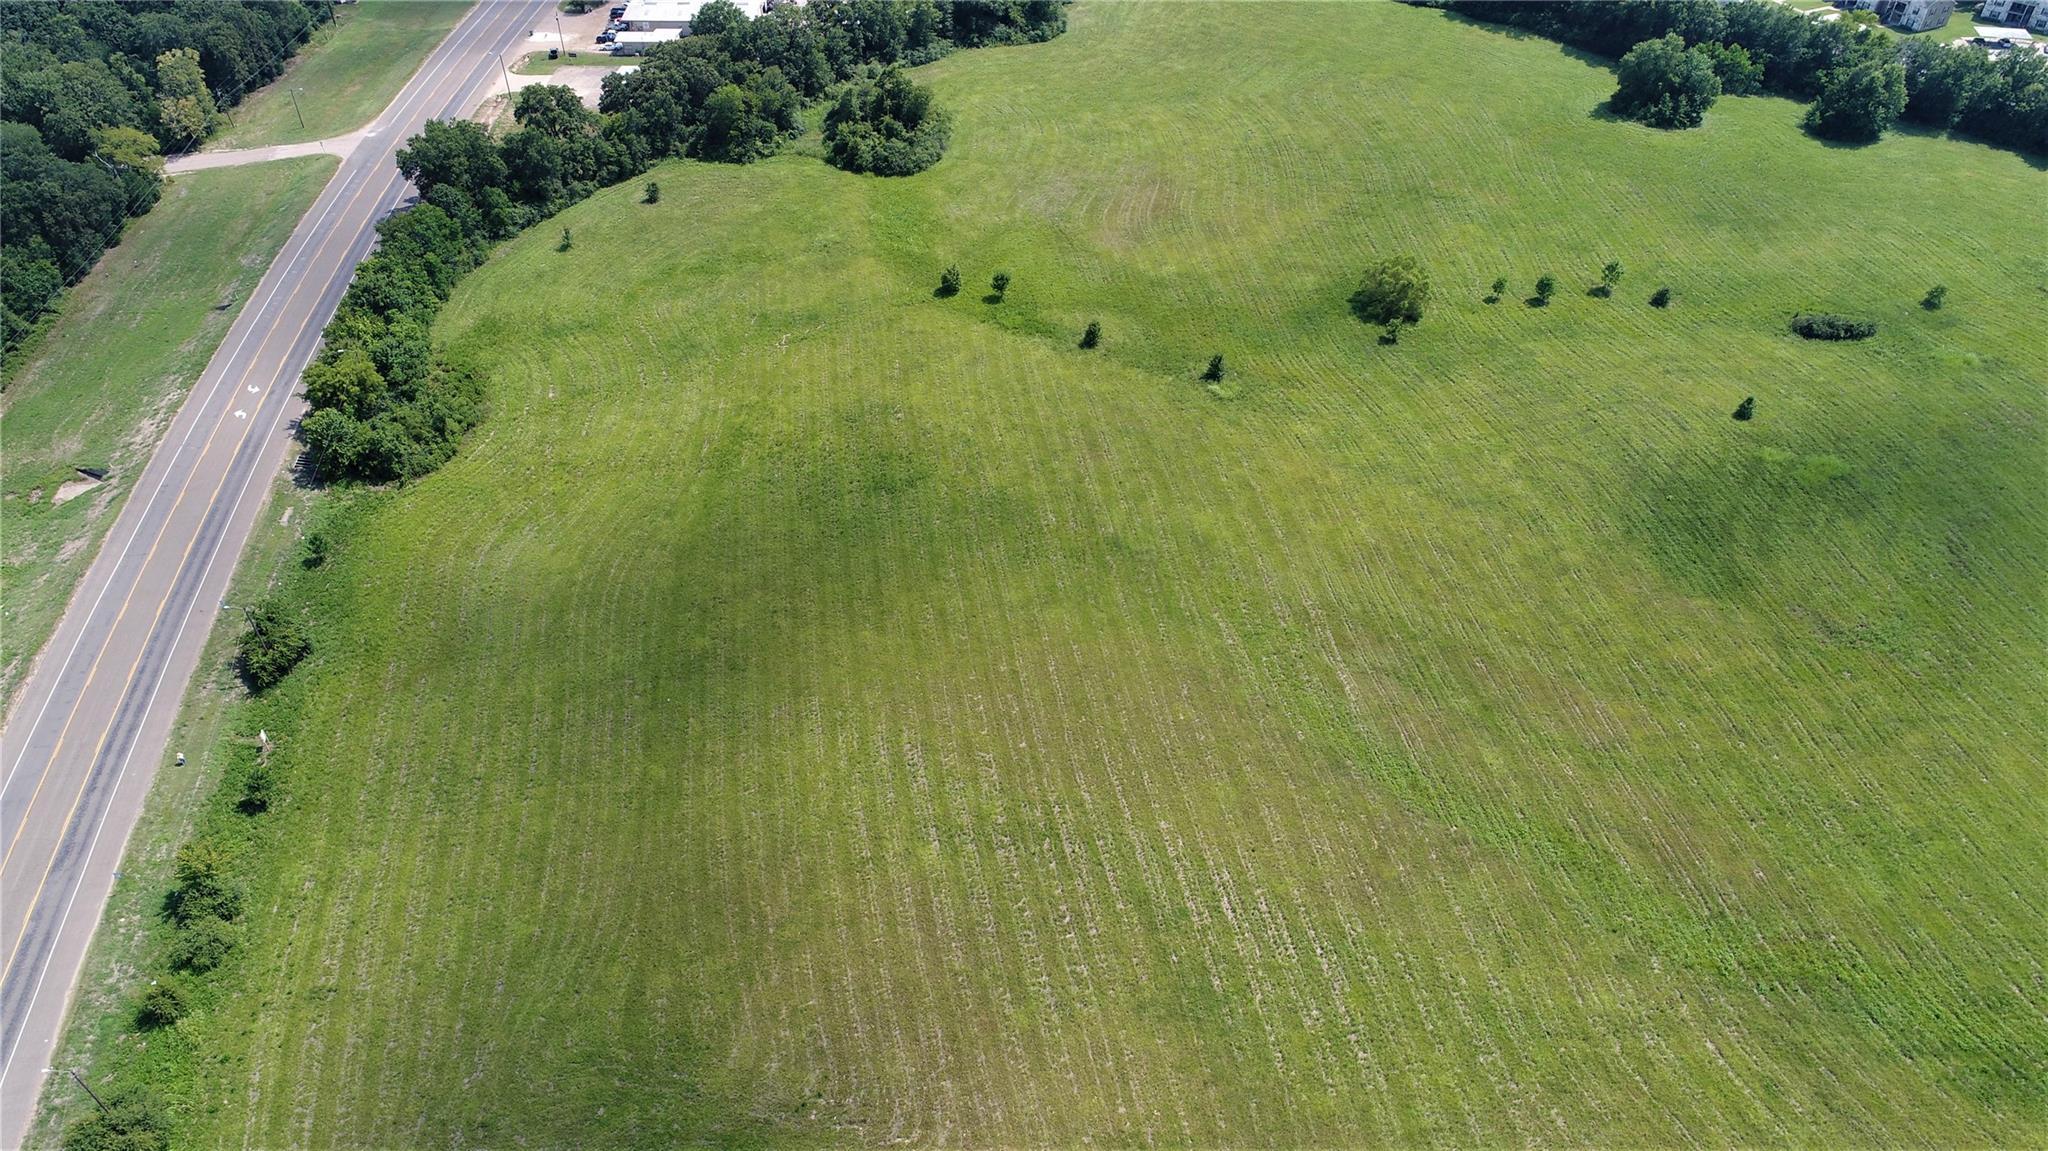 TBD Loop 304 Property Photo - Crockett, TX real estate listing